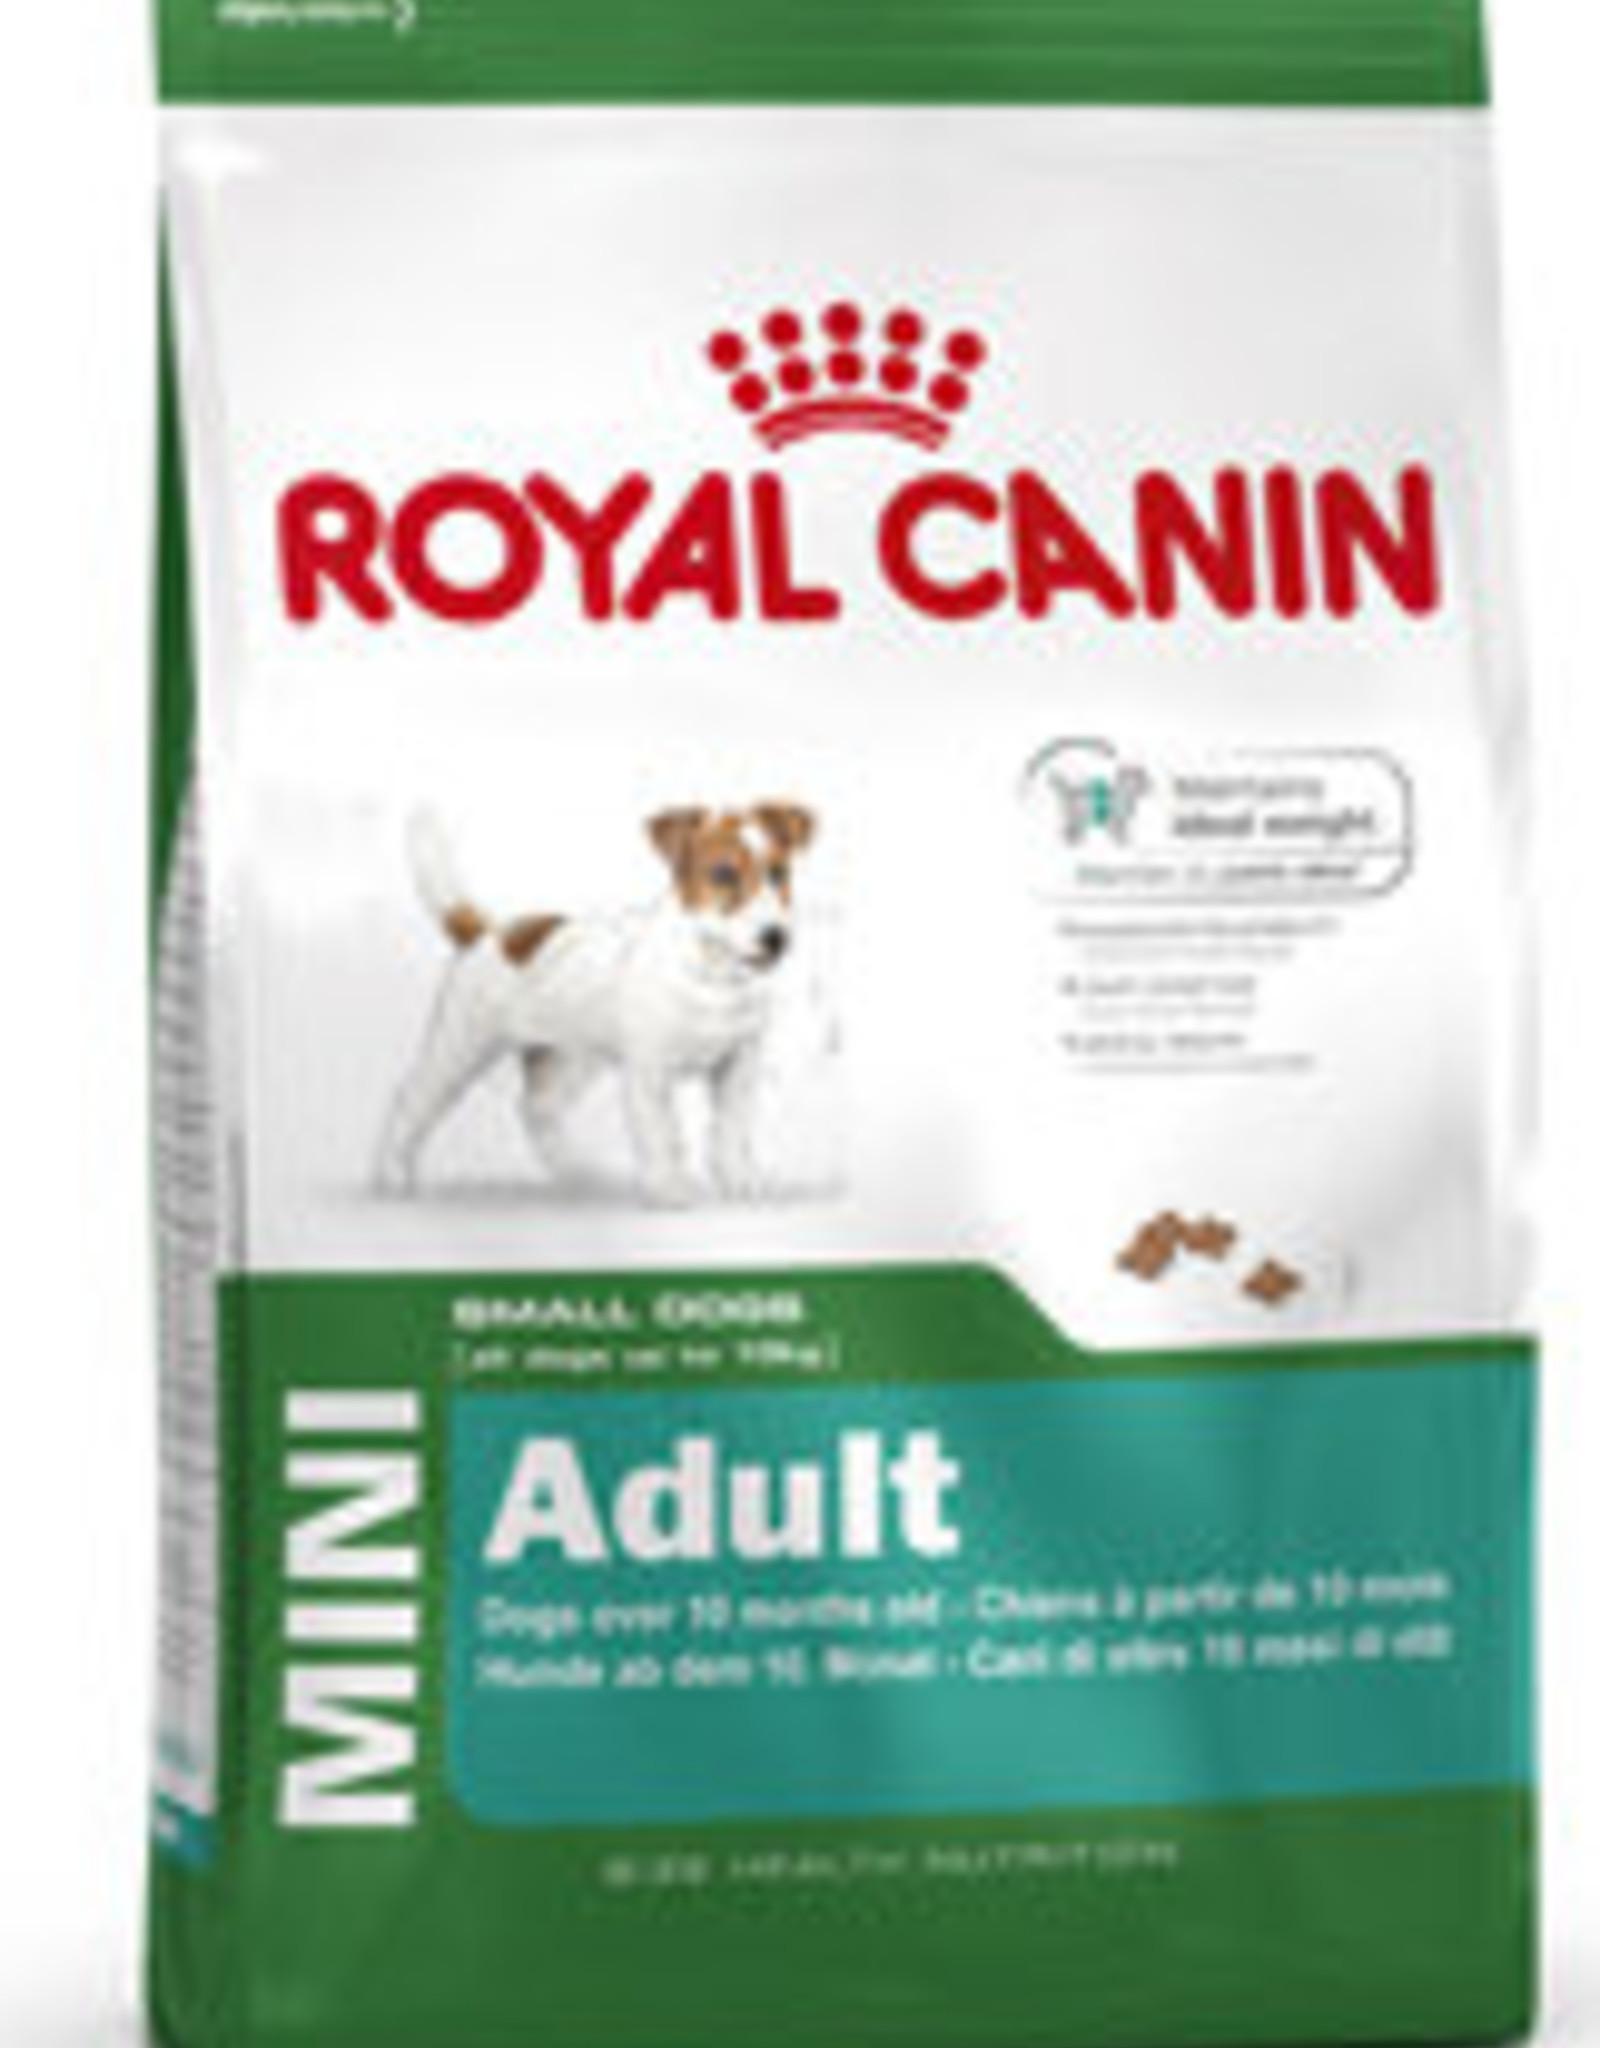 Royal Canin Royal Canin Shn Mini Adult Chien 4kg